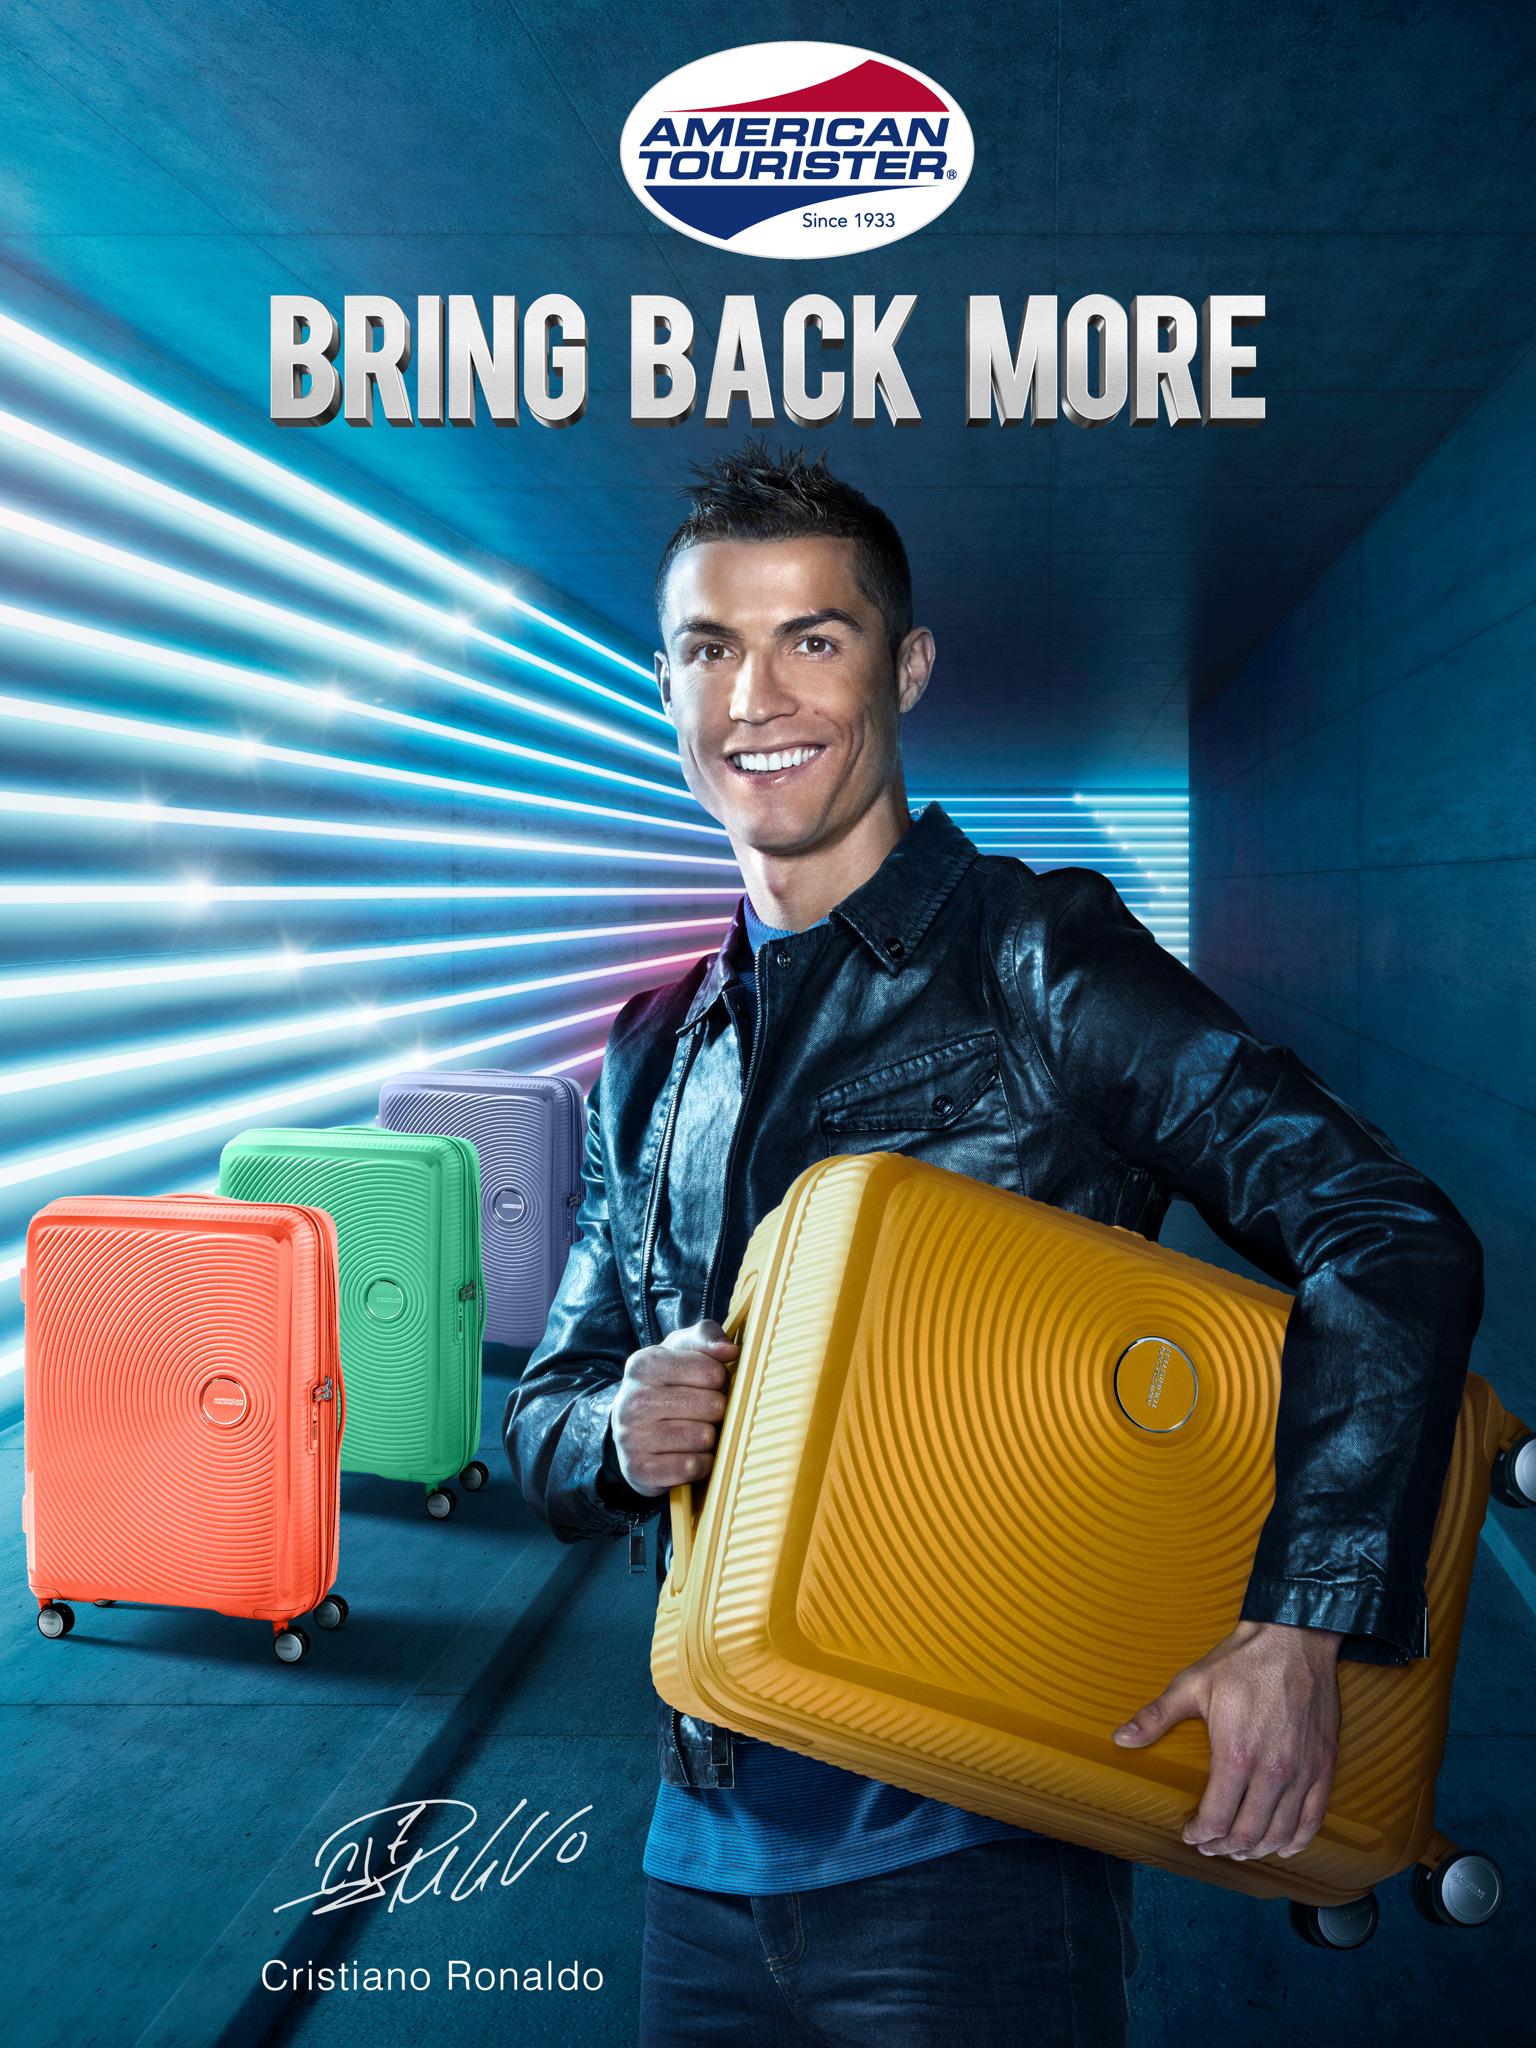 fe309a4afe 'Bring Back More' : Cristiano Ronaldo est le nouvel ambassadeur de la  marque American Tourister